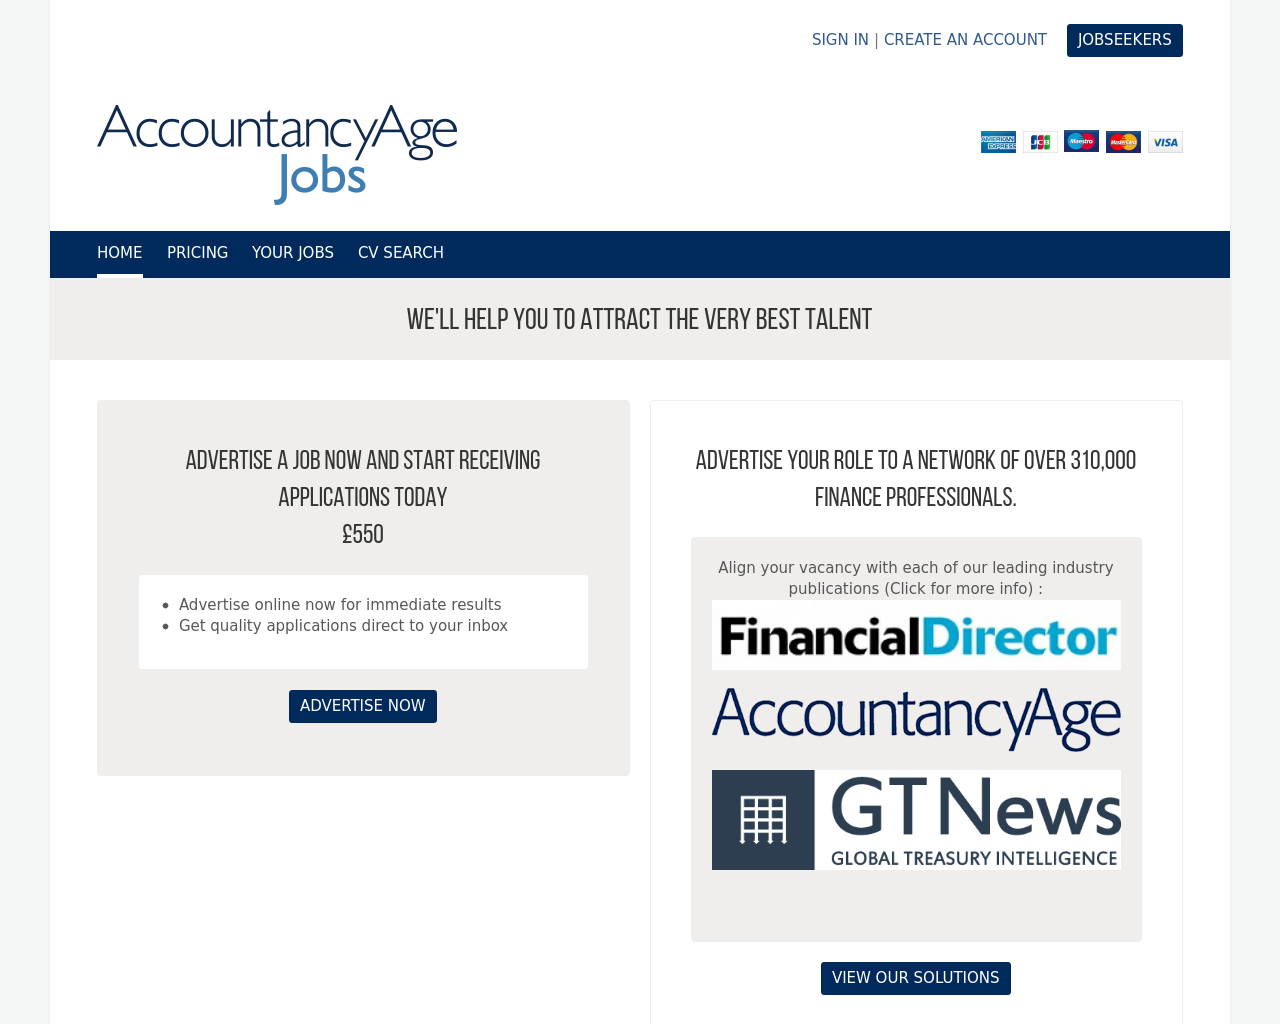 AccountancyAge-Jobs-Advertising-Reviews-Pricing